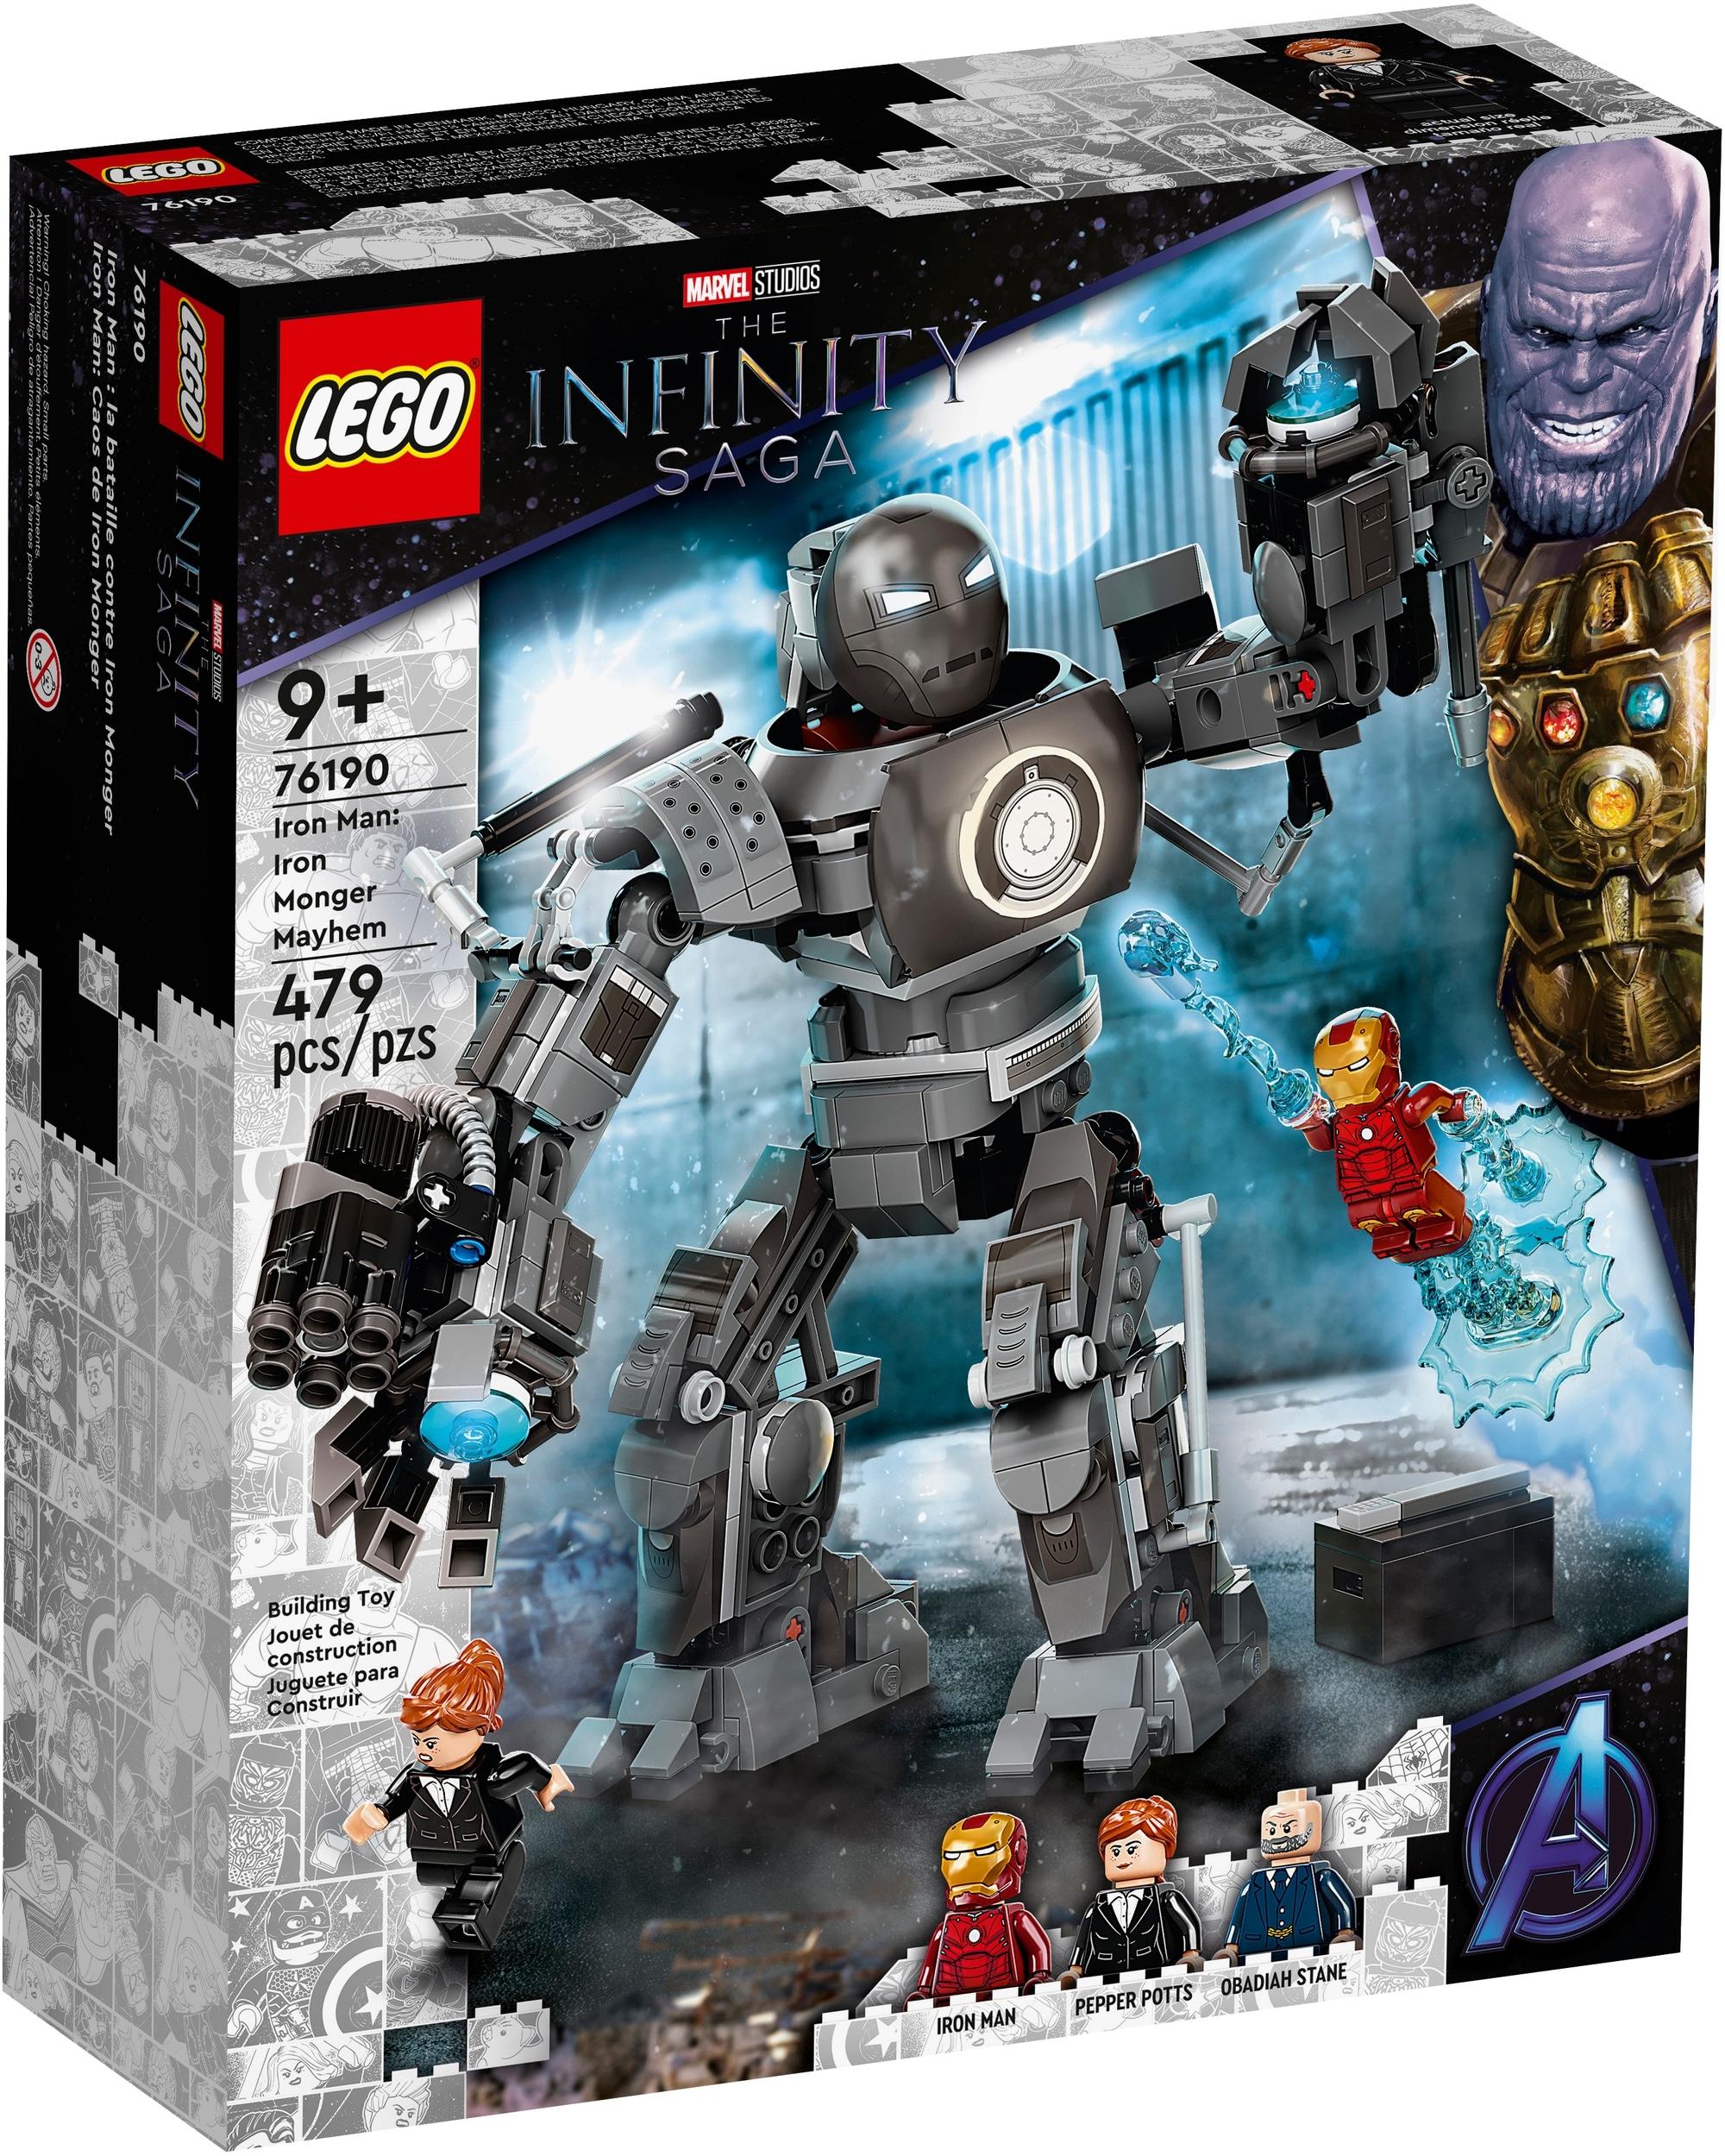 LEGO Marvel 76190 Iron Man Und Das Chaos Durch Iron Monger 2